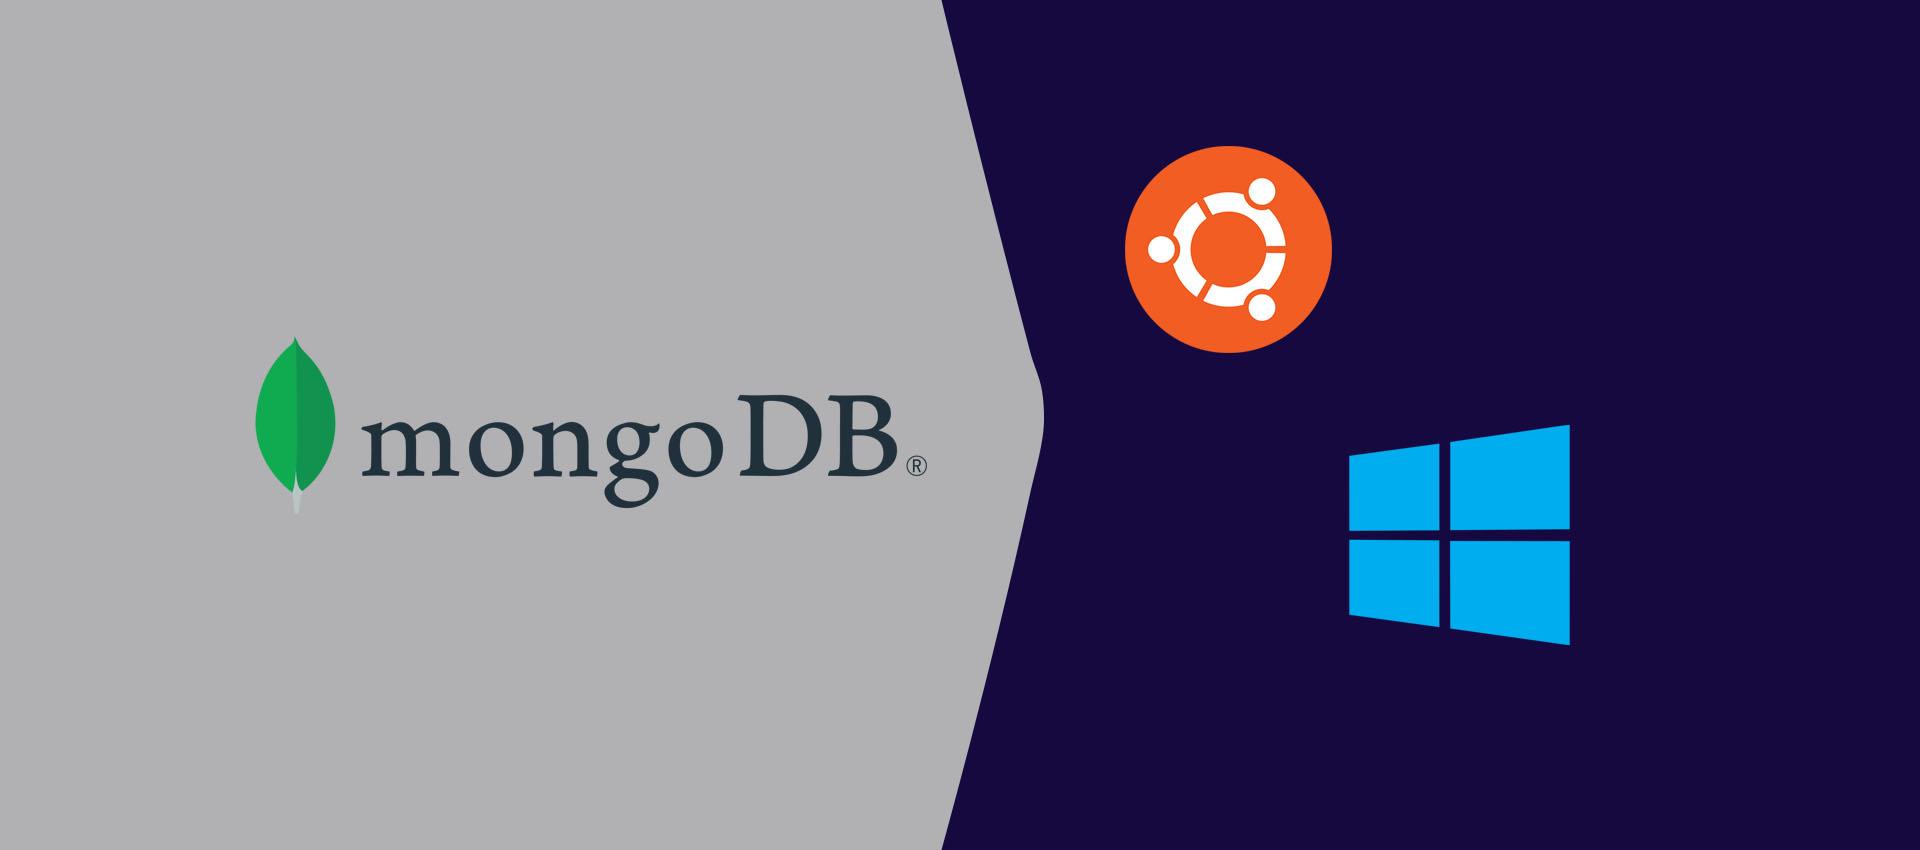 How To Uninstall MongoDB from Windows and Ubuntu